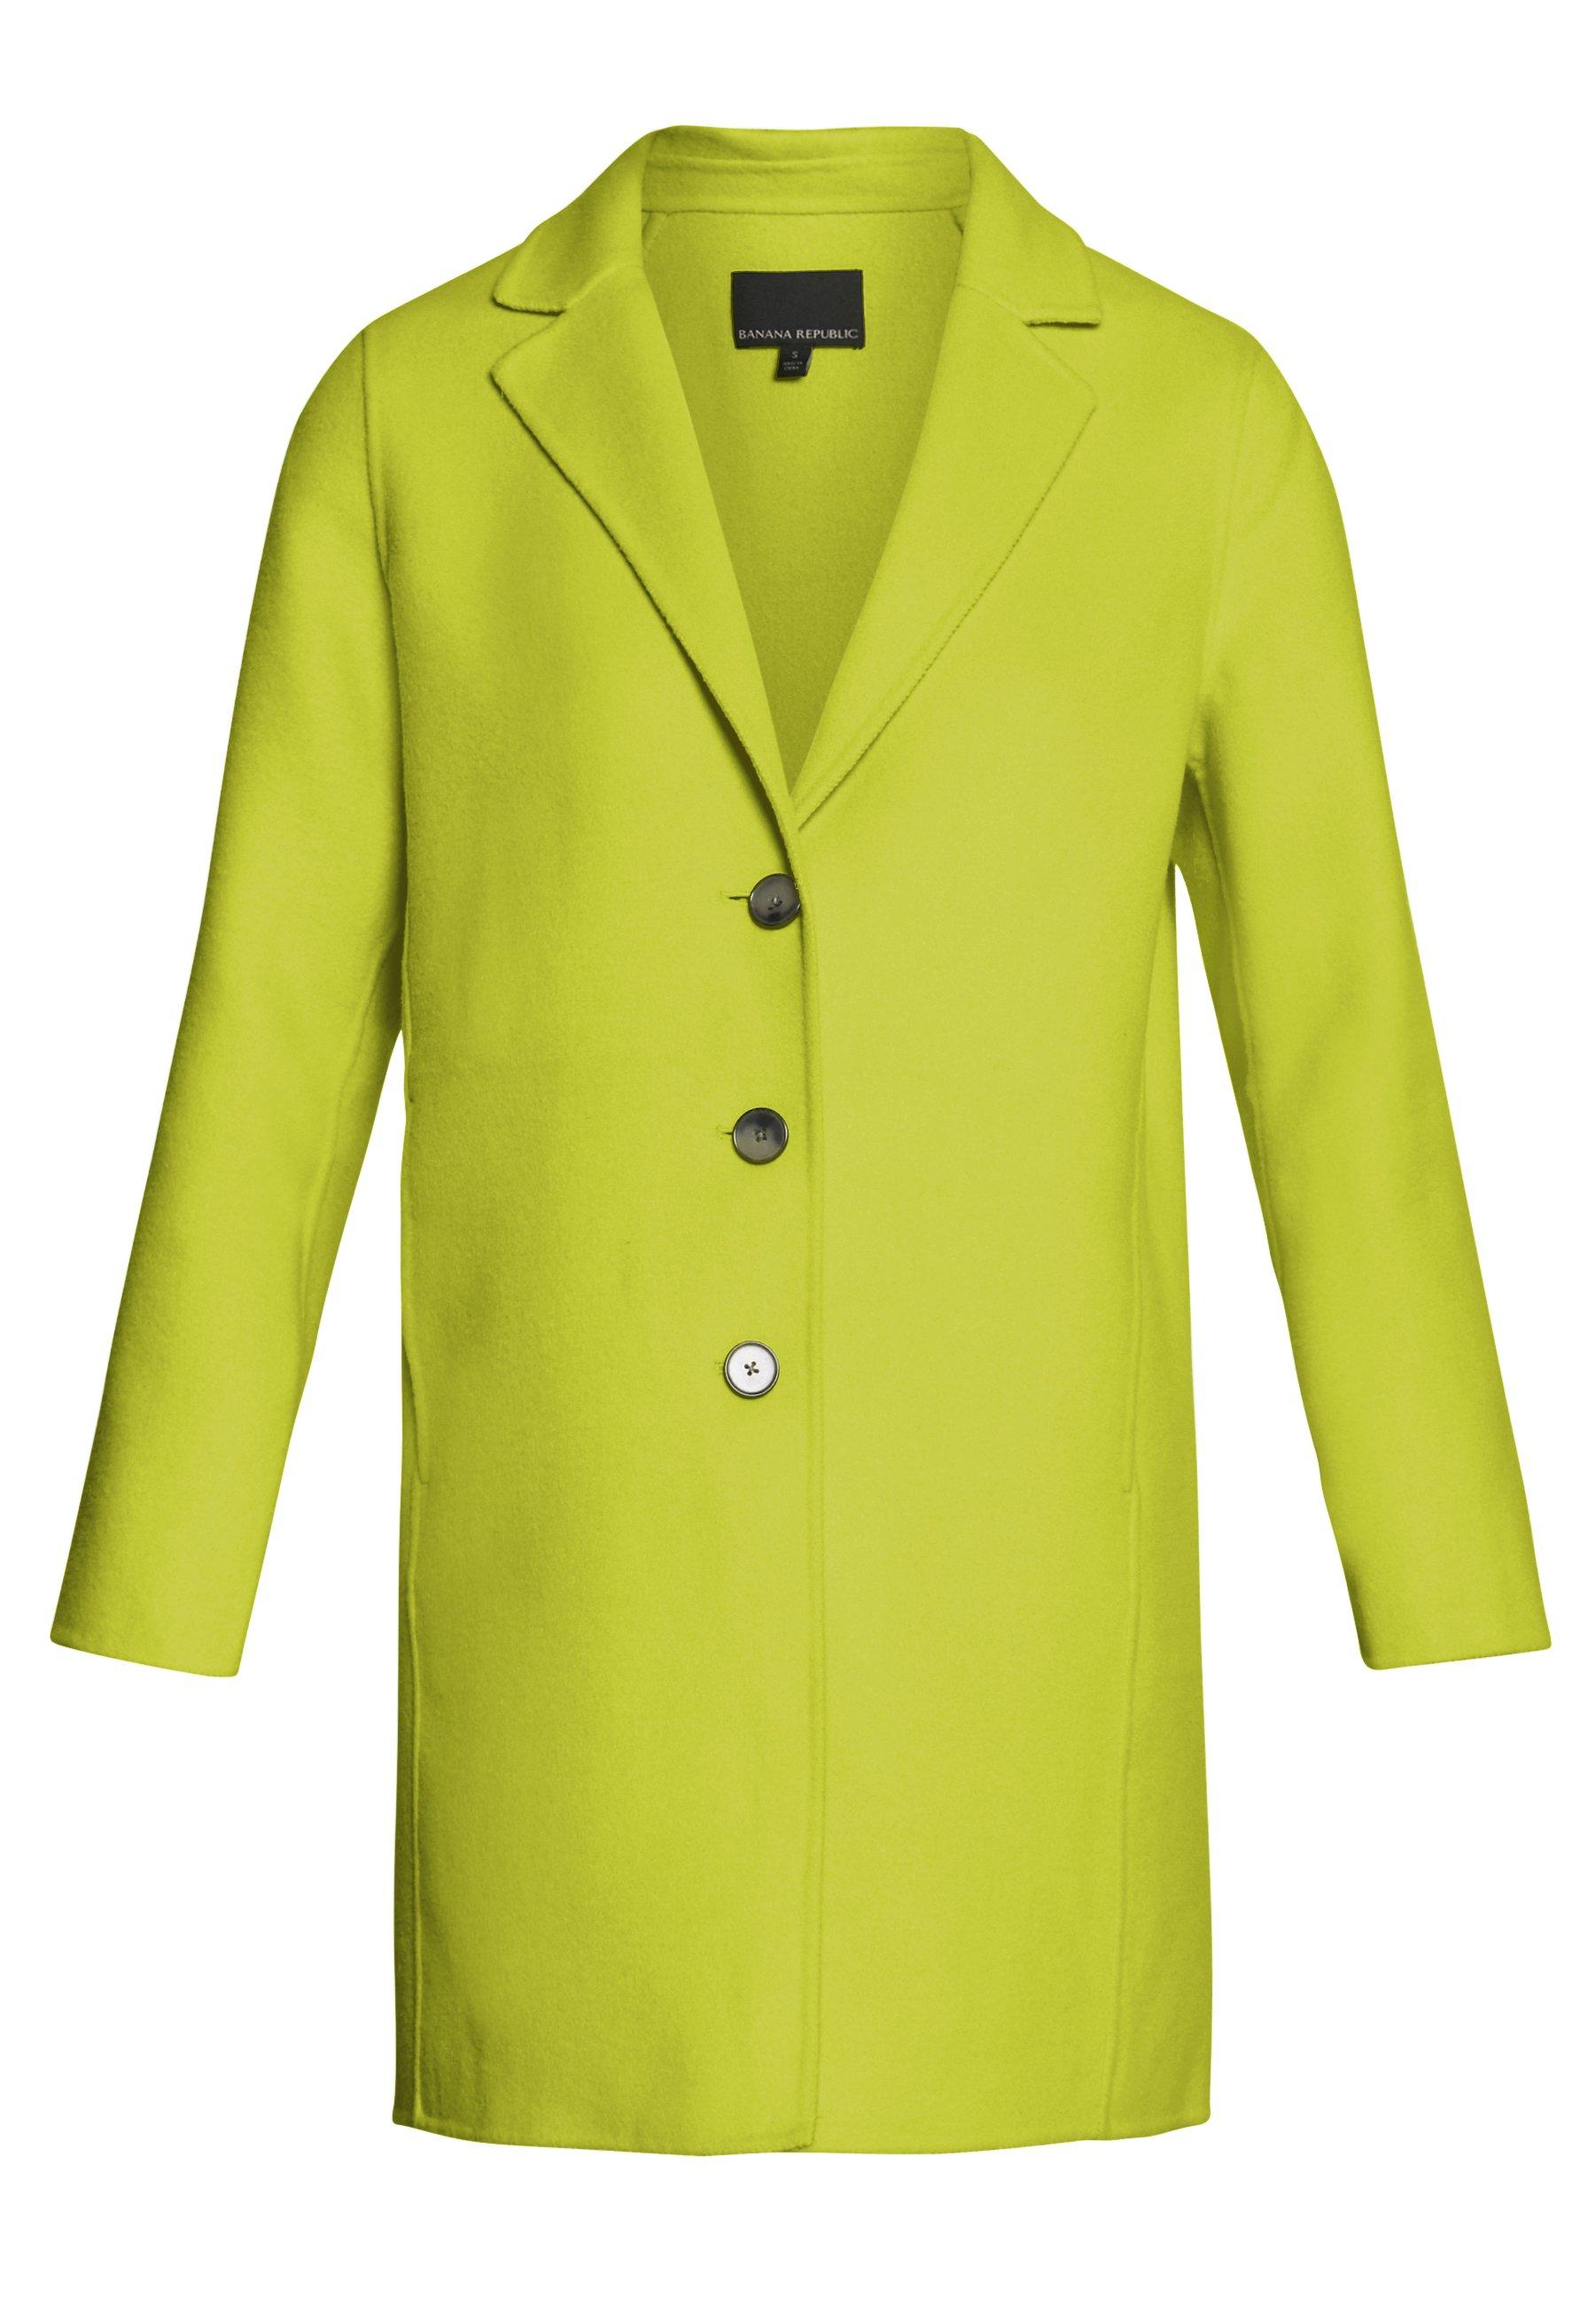 Banana Republic Double Face Coat - Kort Kappa / Rock Neon Yellow